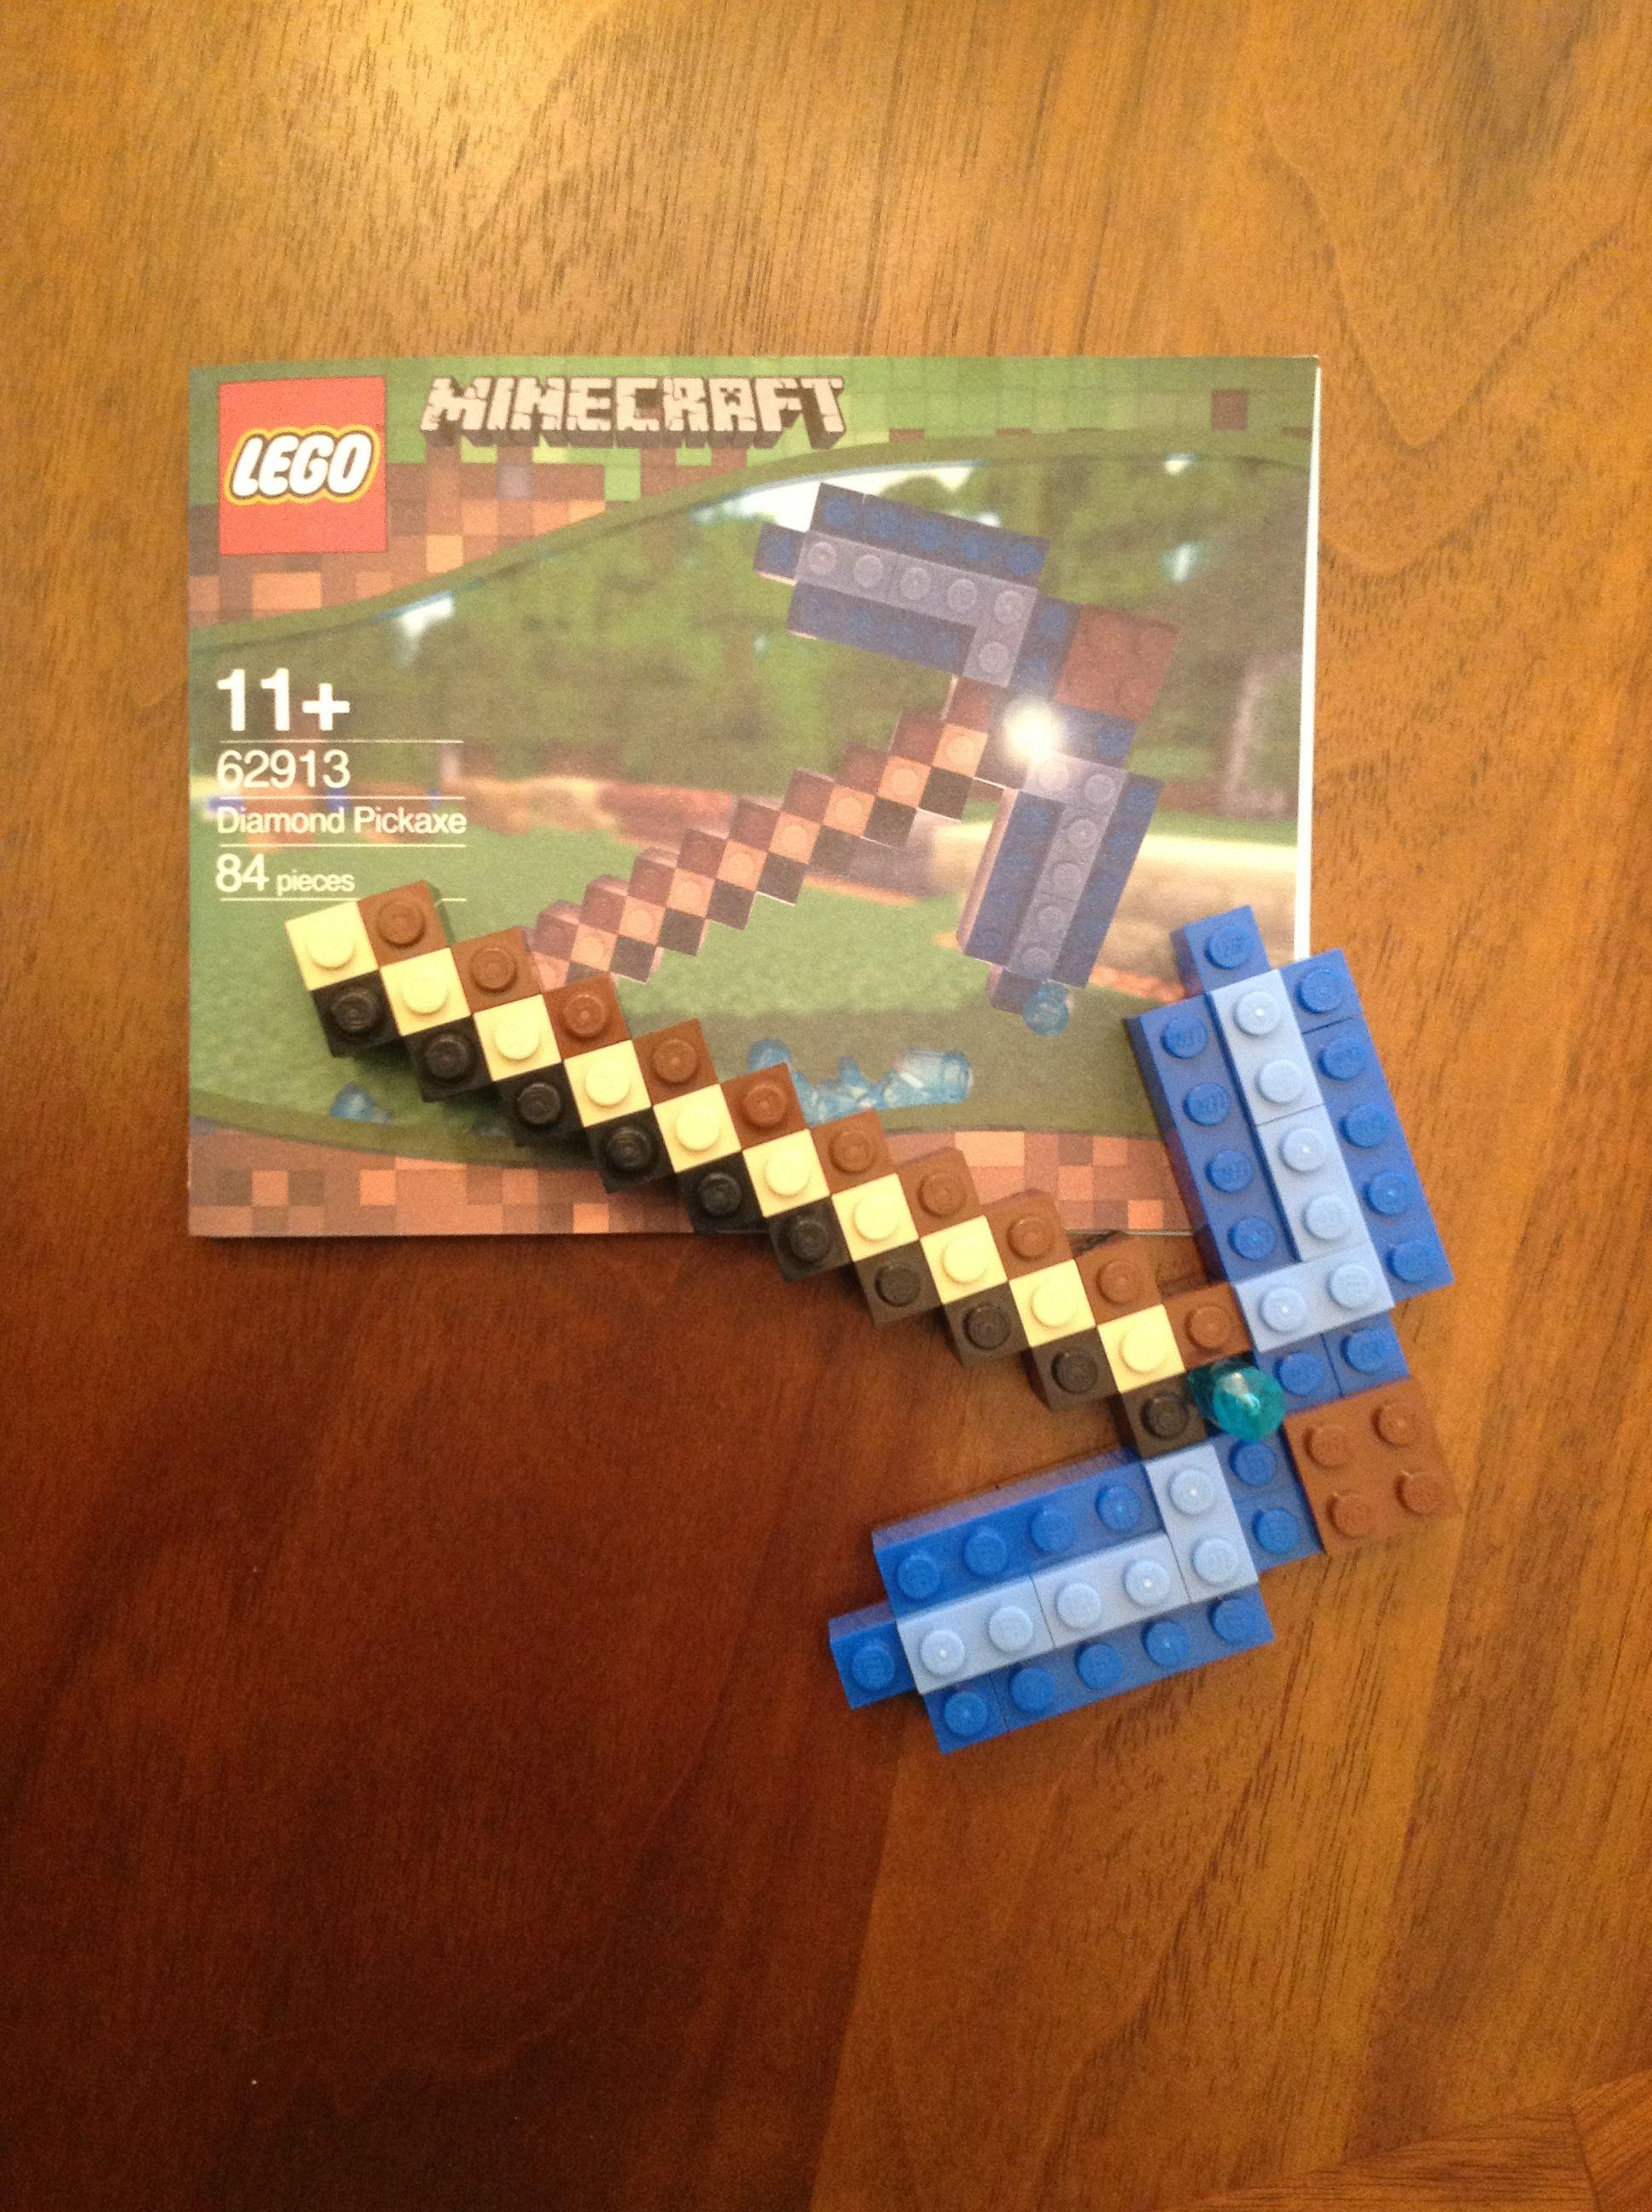 Custom Designed Minecraft Diamond Pickaxe Lego Mini Build For Party